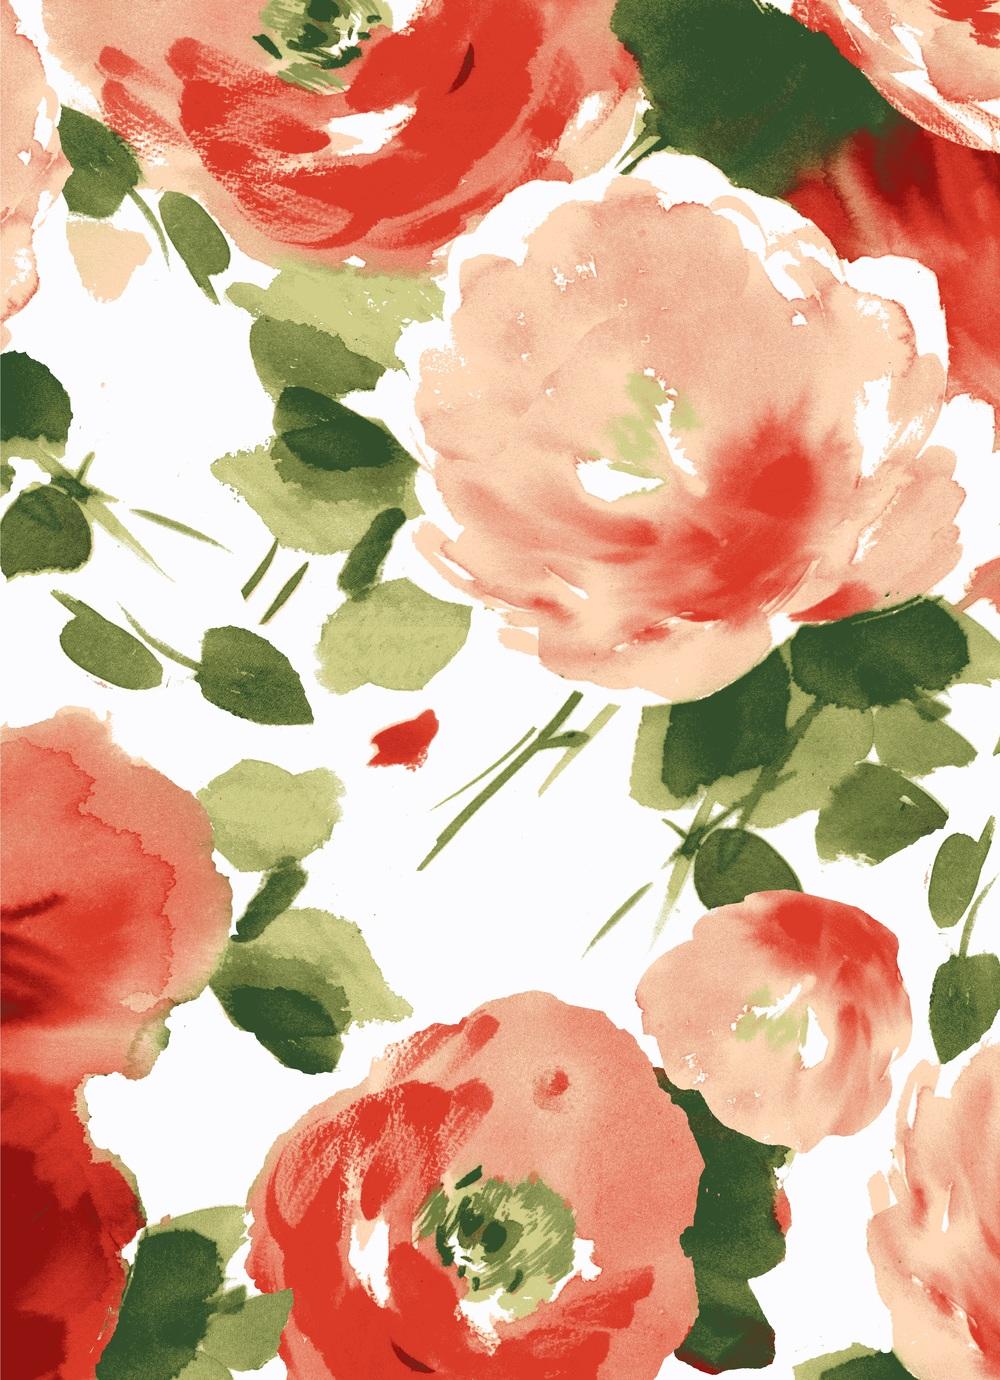 painted peach floral.jpg